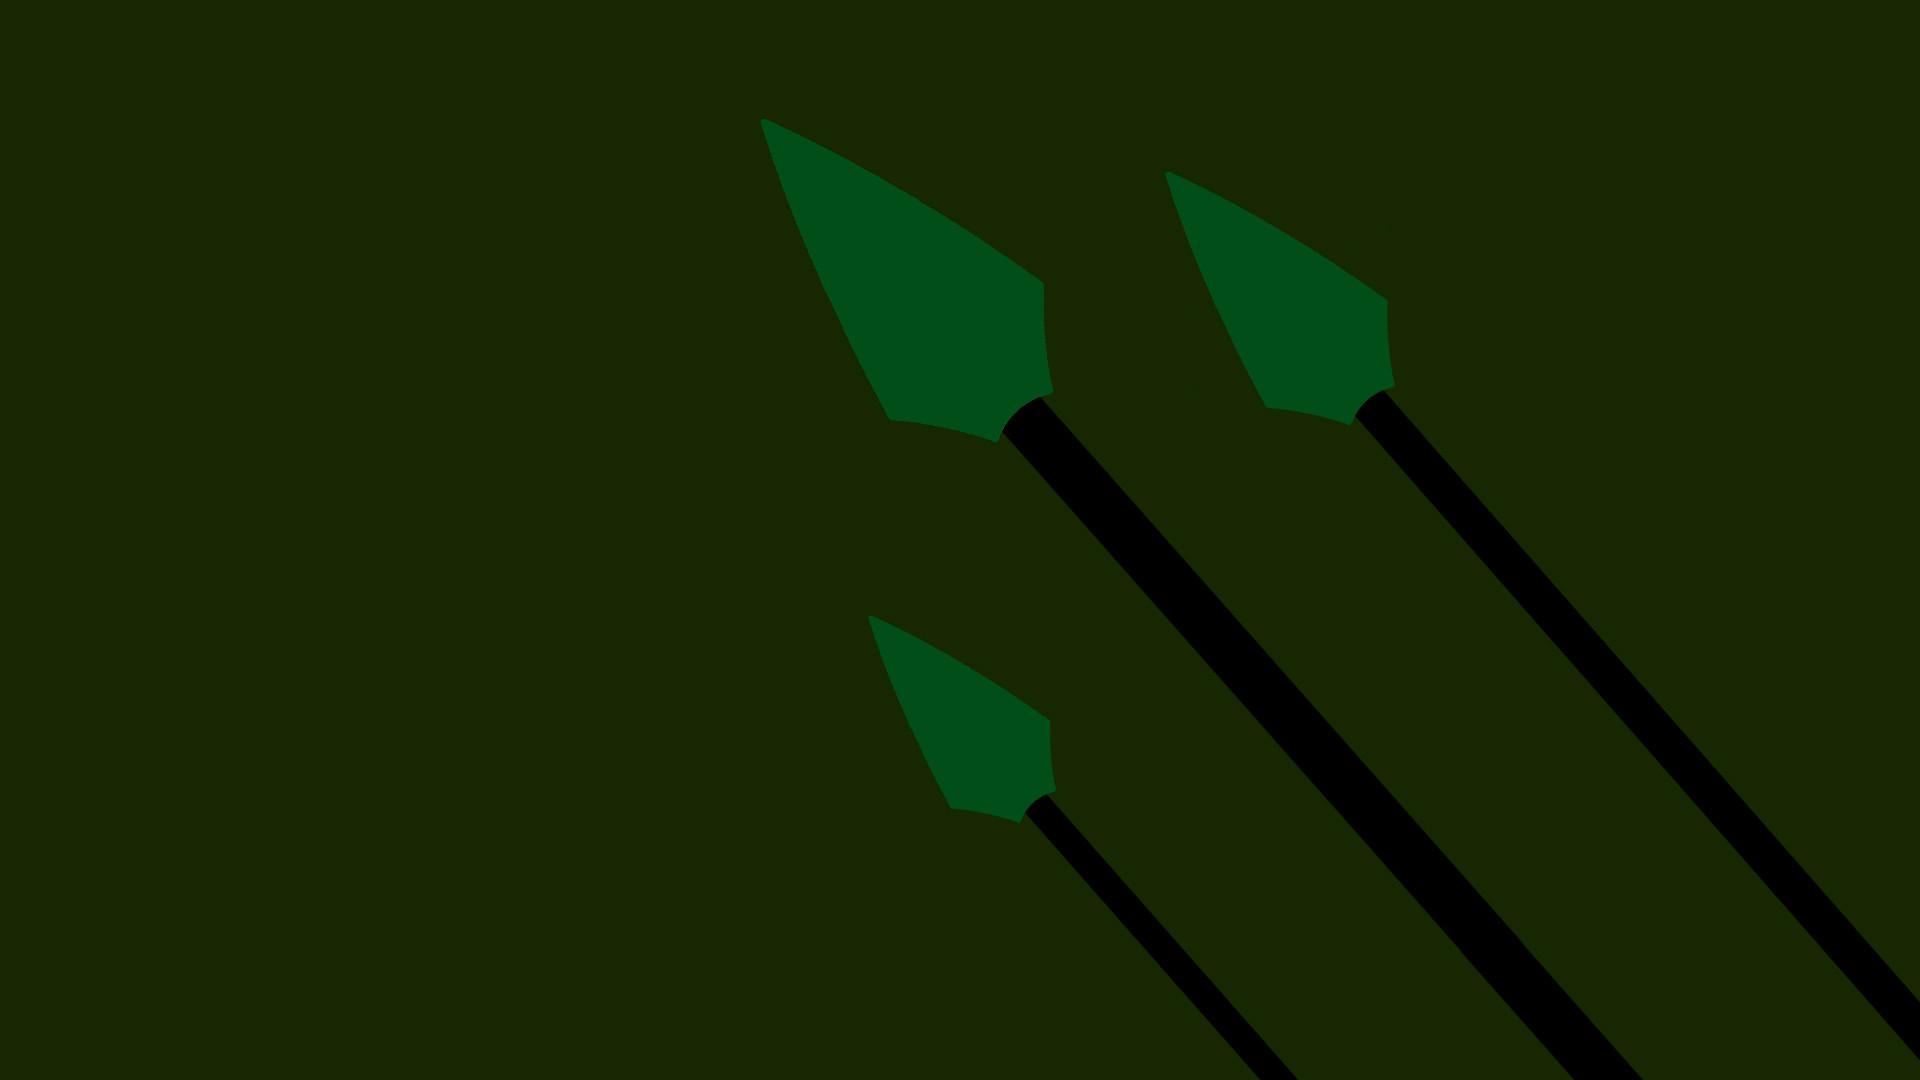 Green Arrow Wallpaper 1920×1080